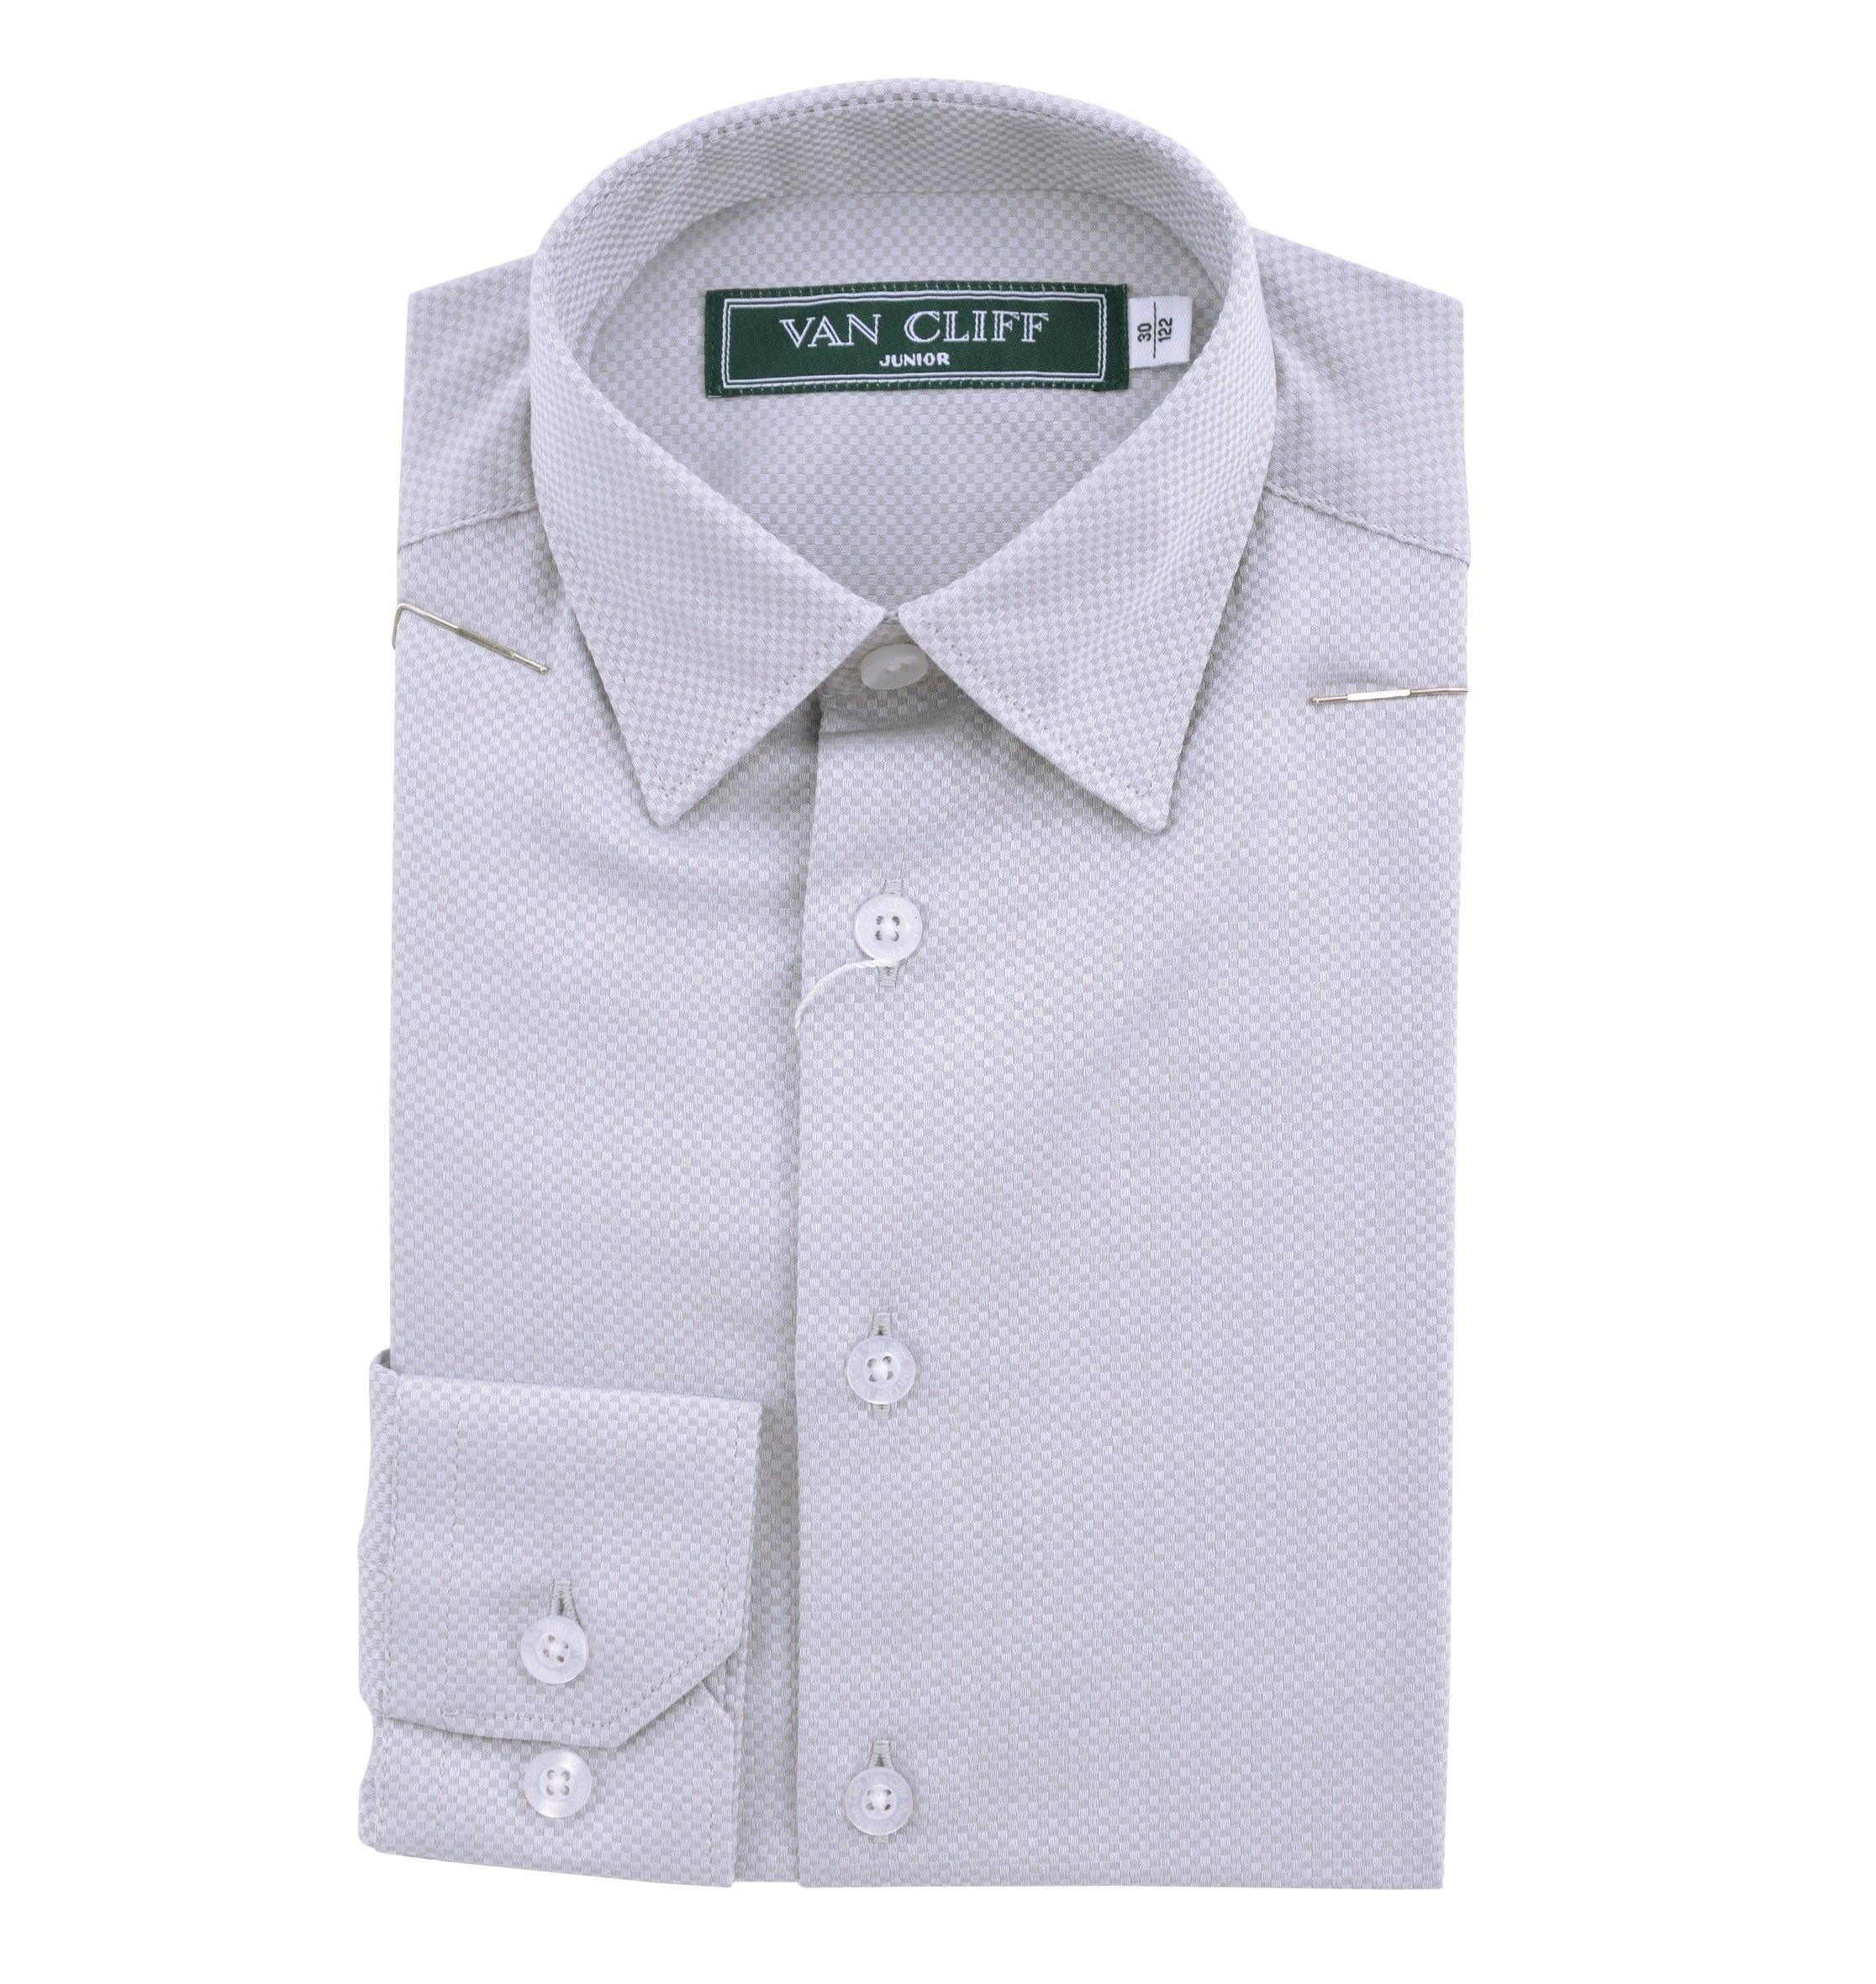 Рубашка для мальчика YSVC16571сер